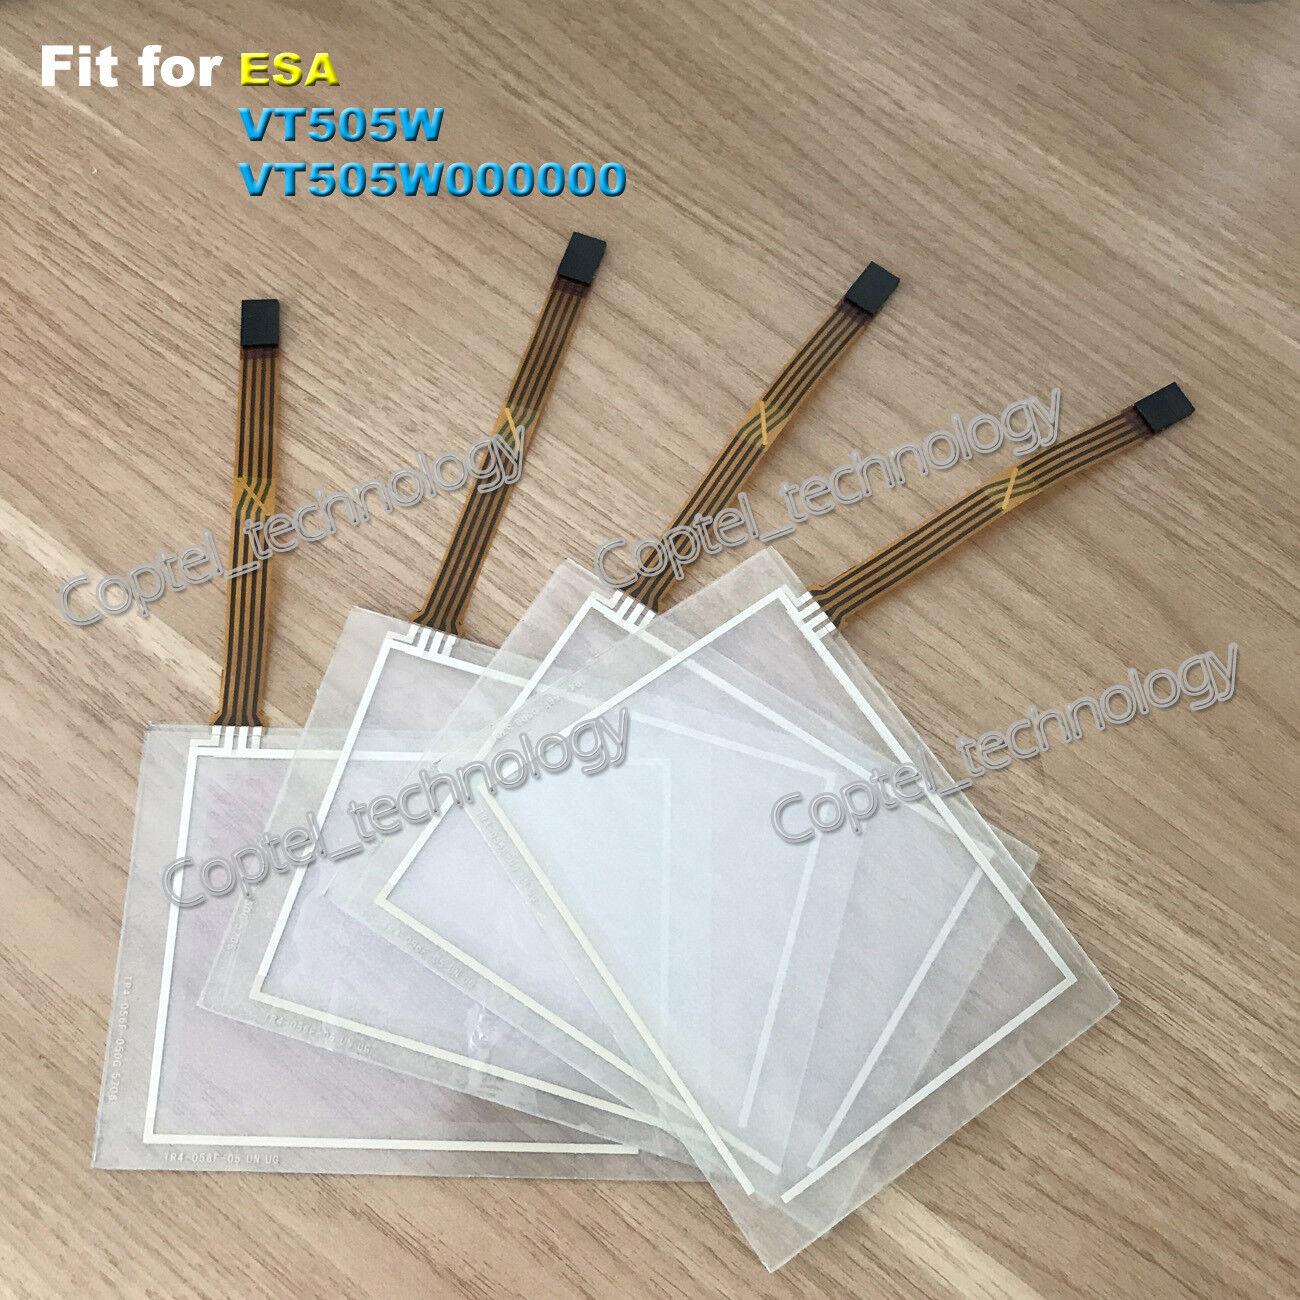 For ESA VT505W VT505W000000 Touch Screen Glass 1 Year Warranty